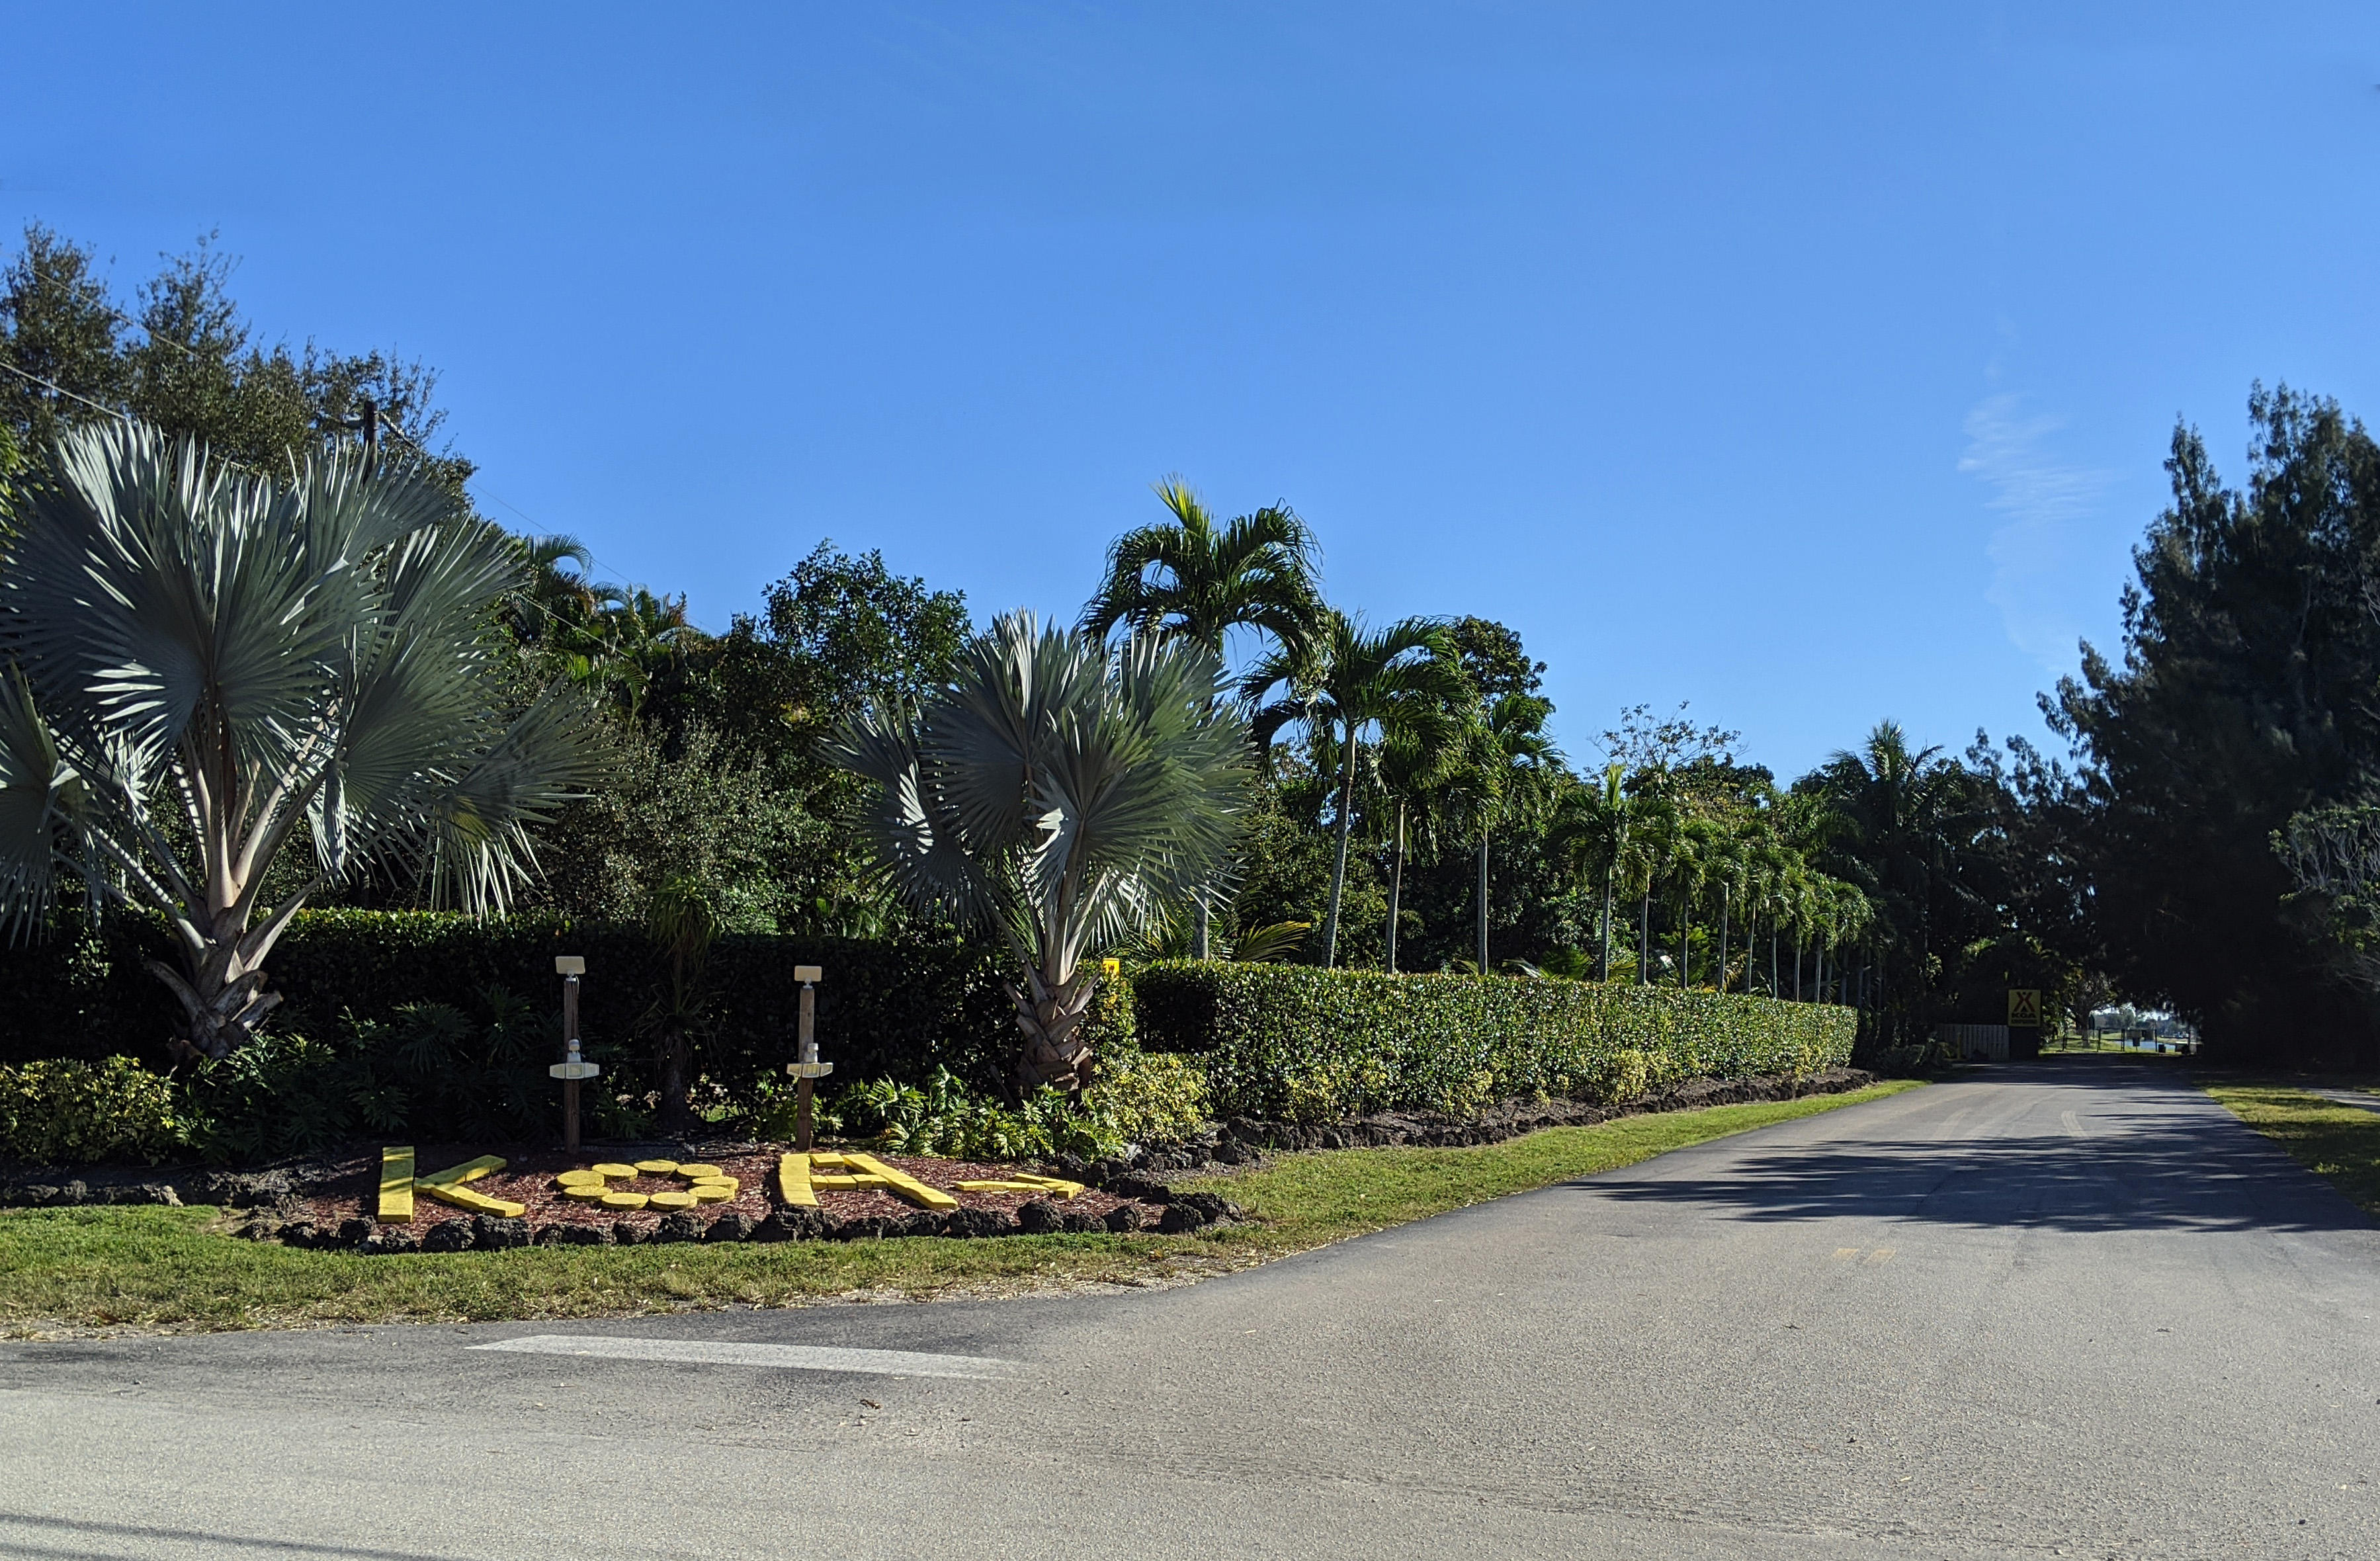 Davie / Ft. Lauderdale KOA Holiday